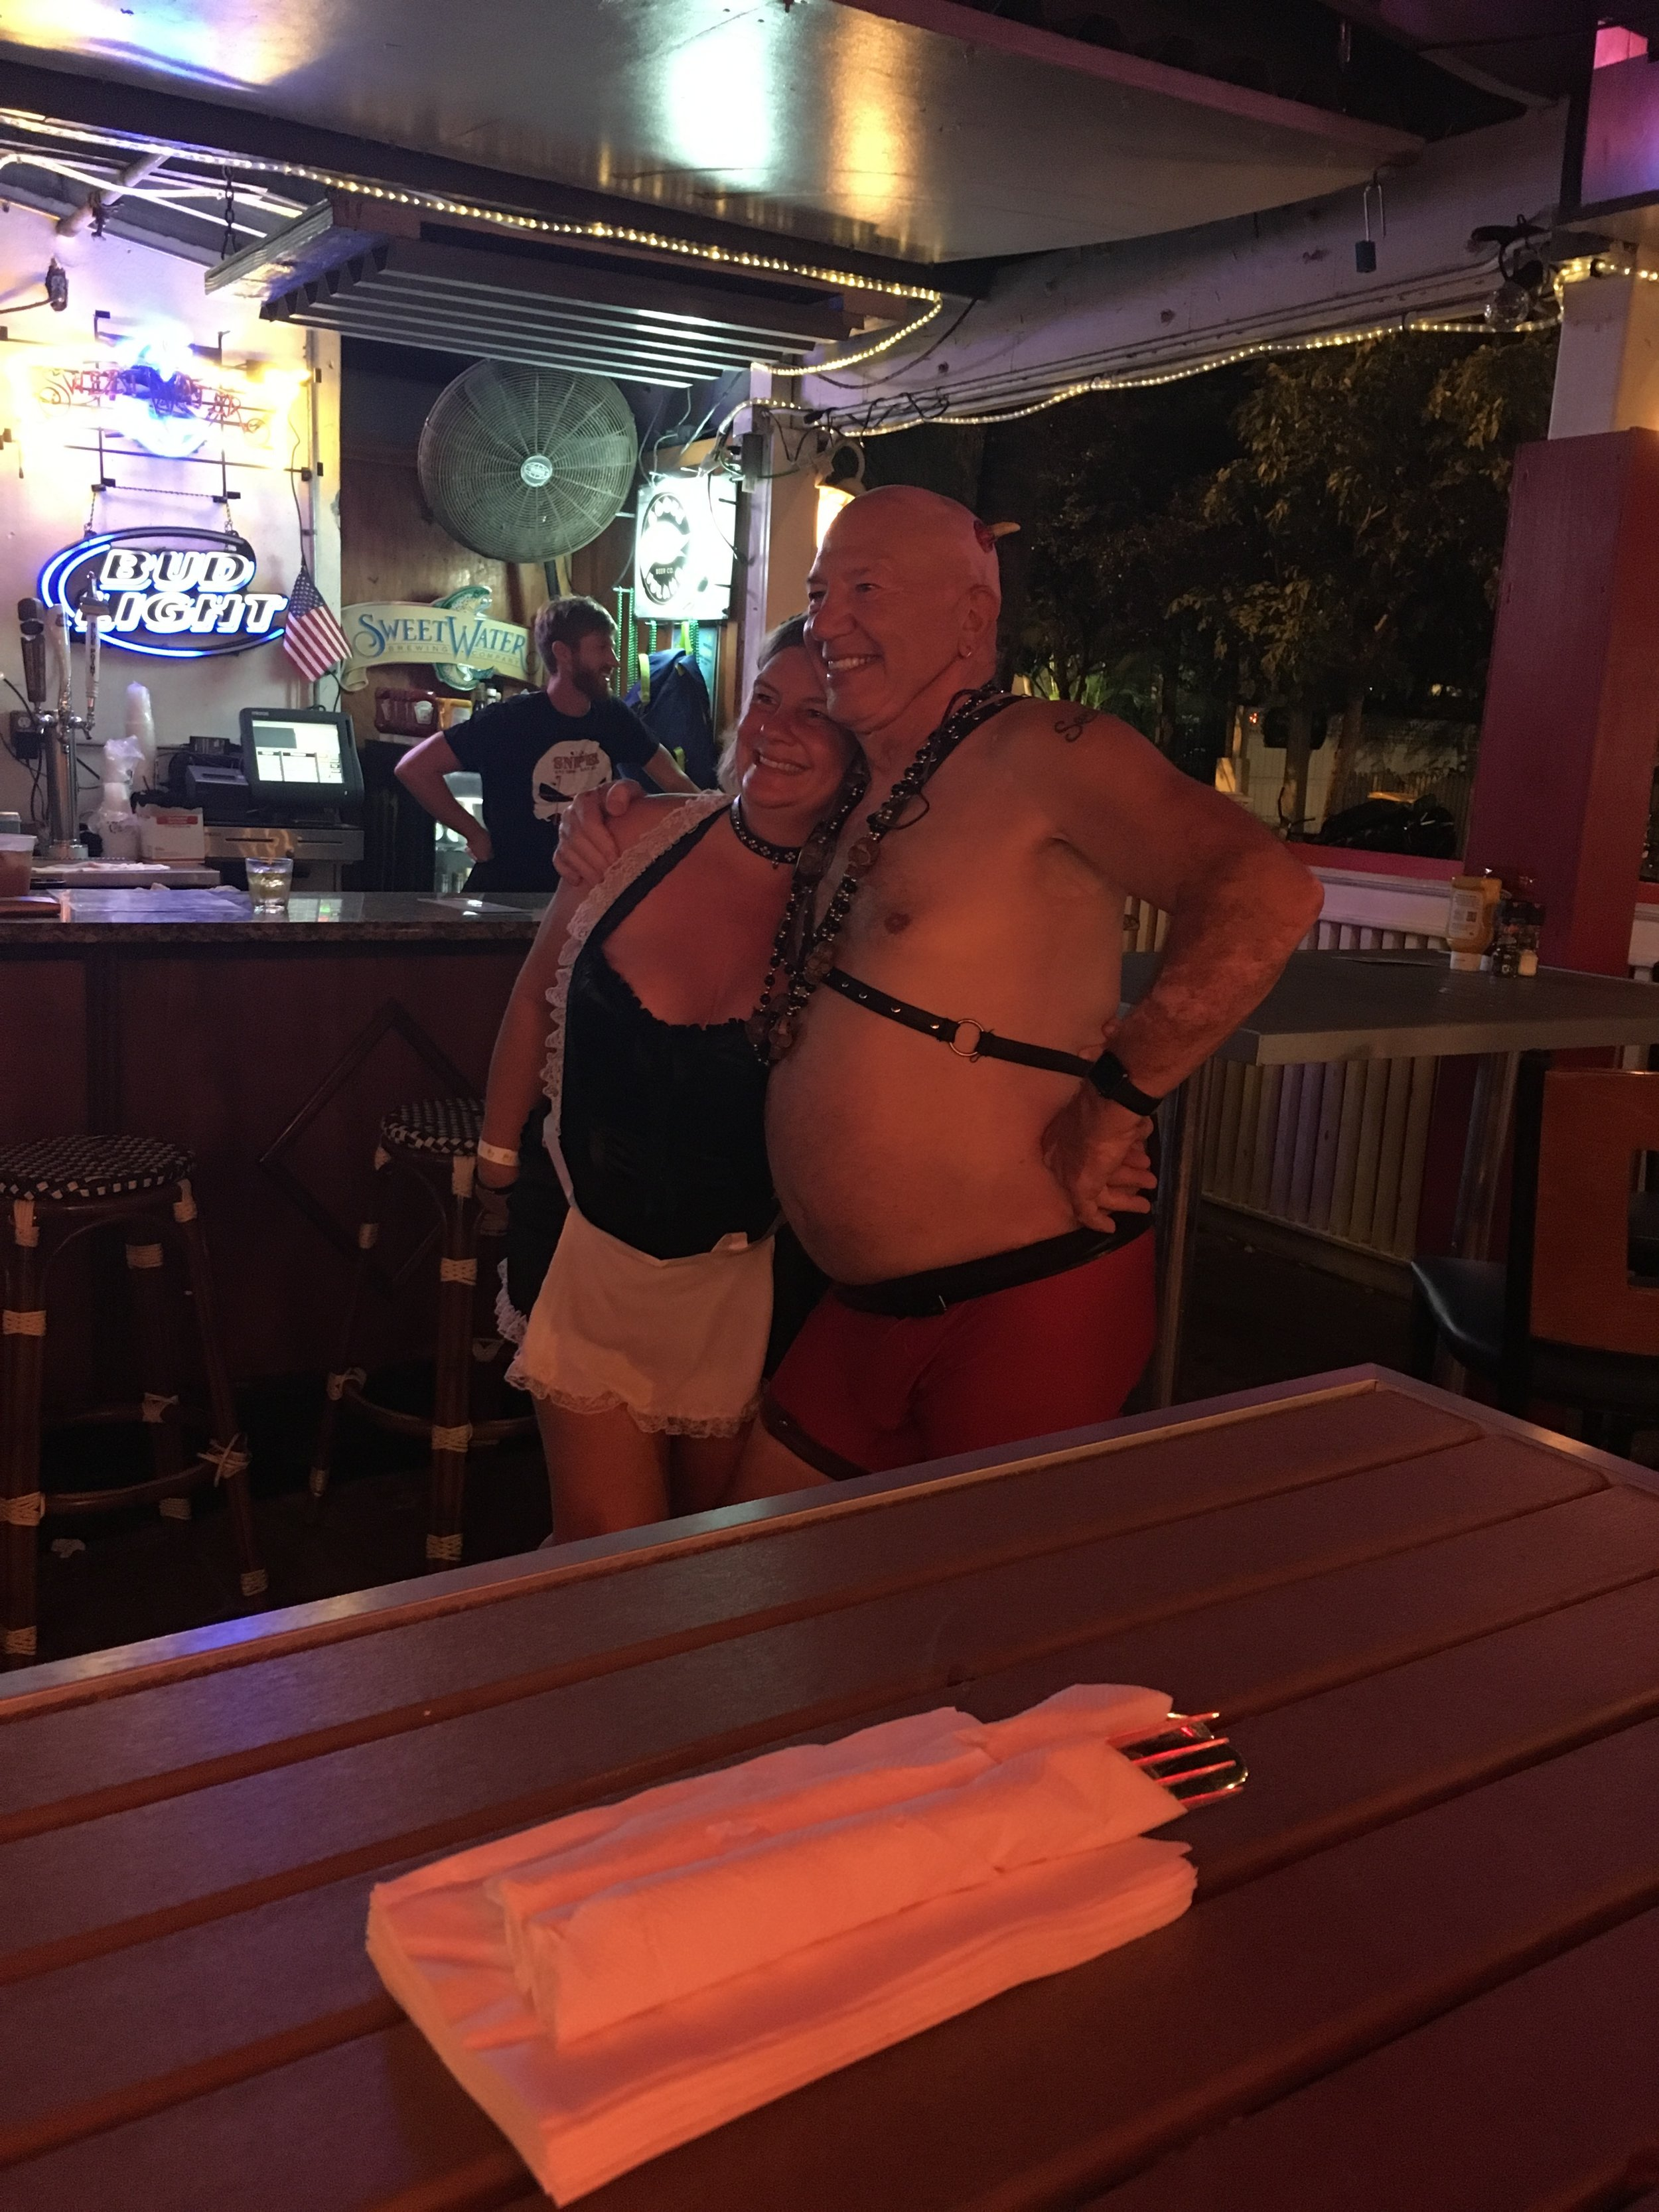 fantasy fest 2016 key west crowd shots pictures BDSM nudity